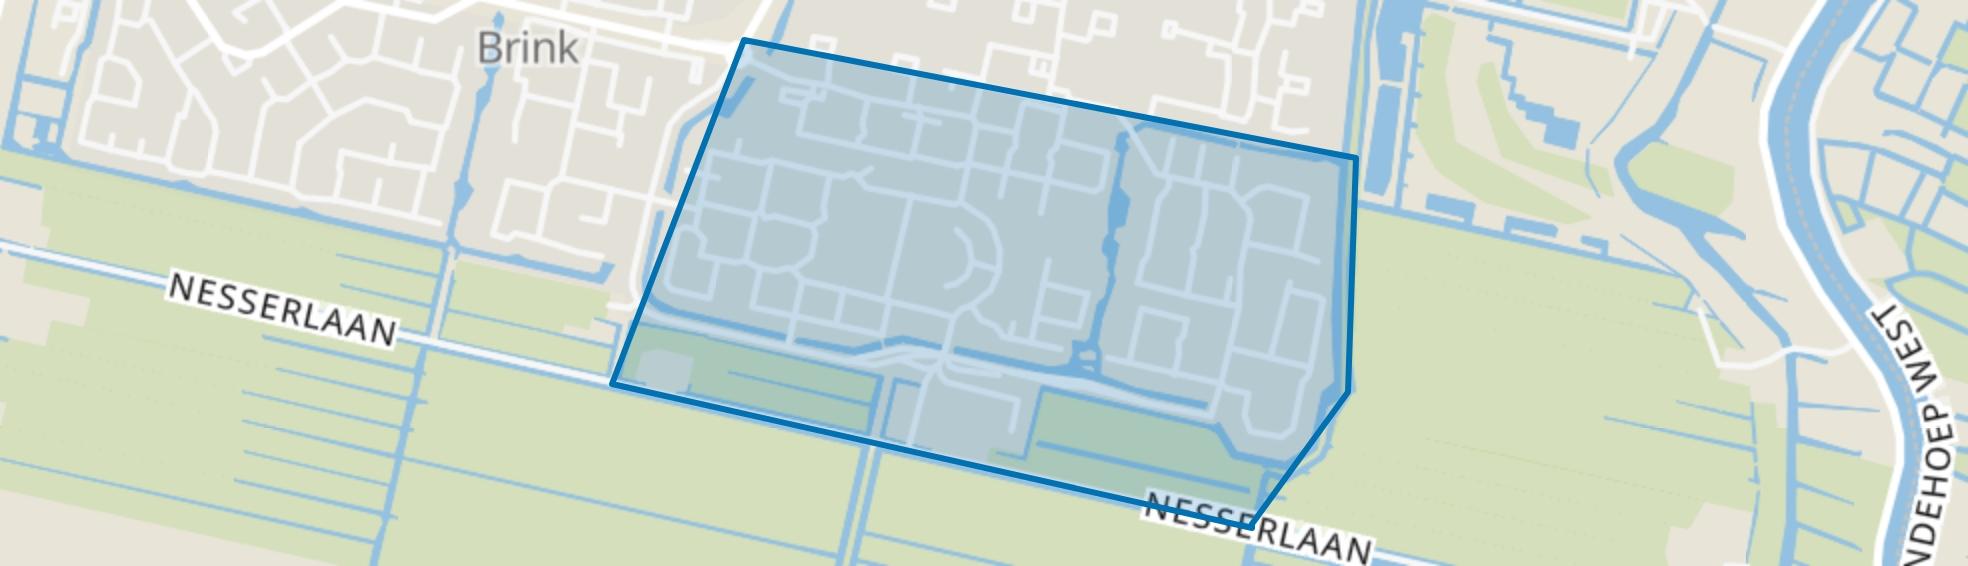 Galjoenbuurt, Amstelveen map